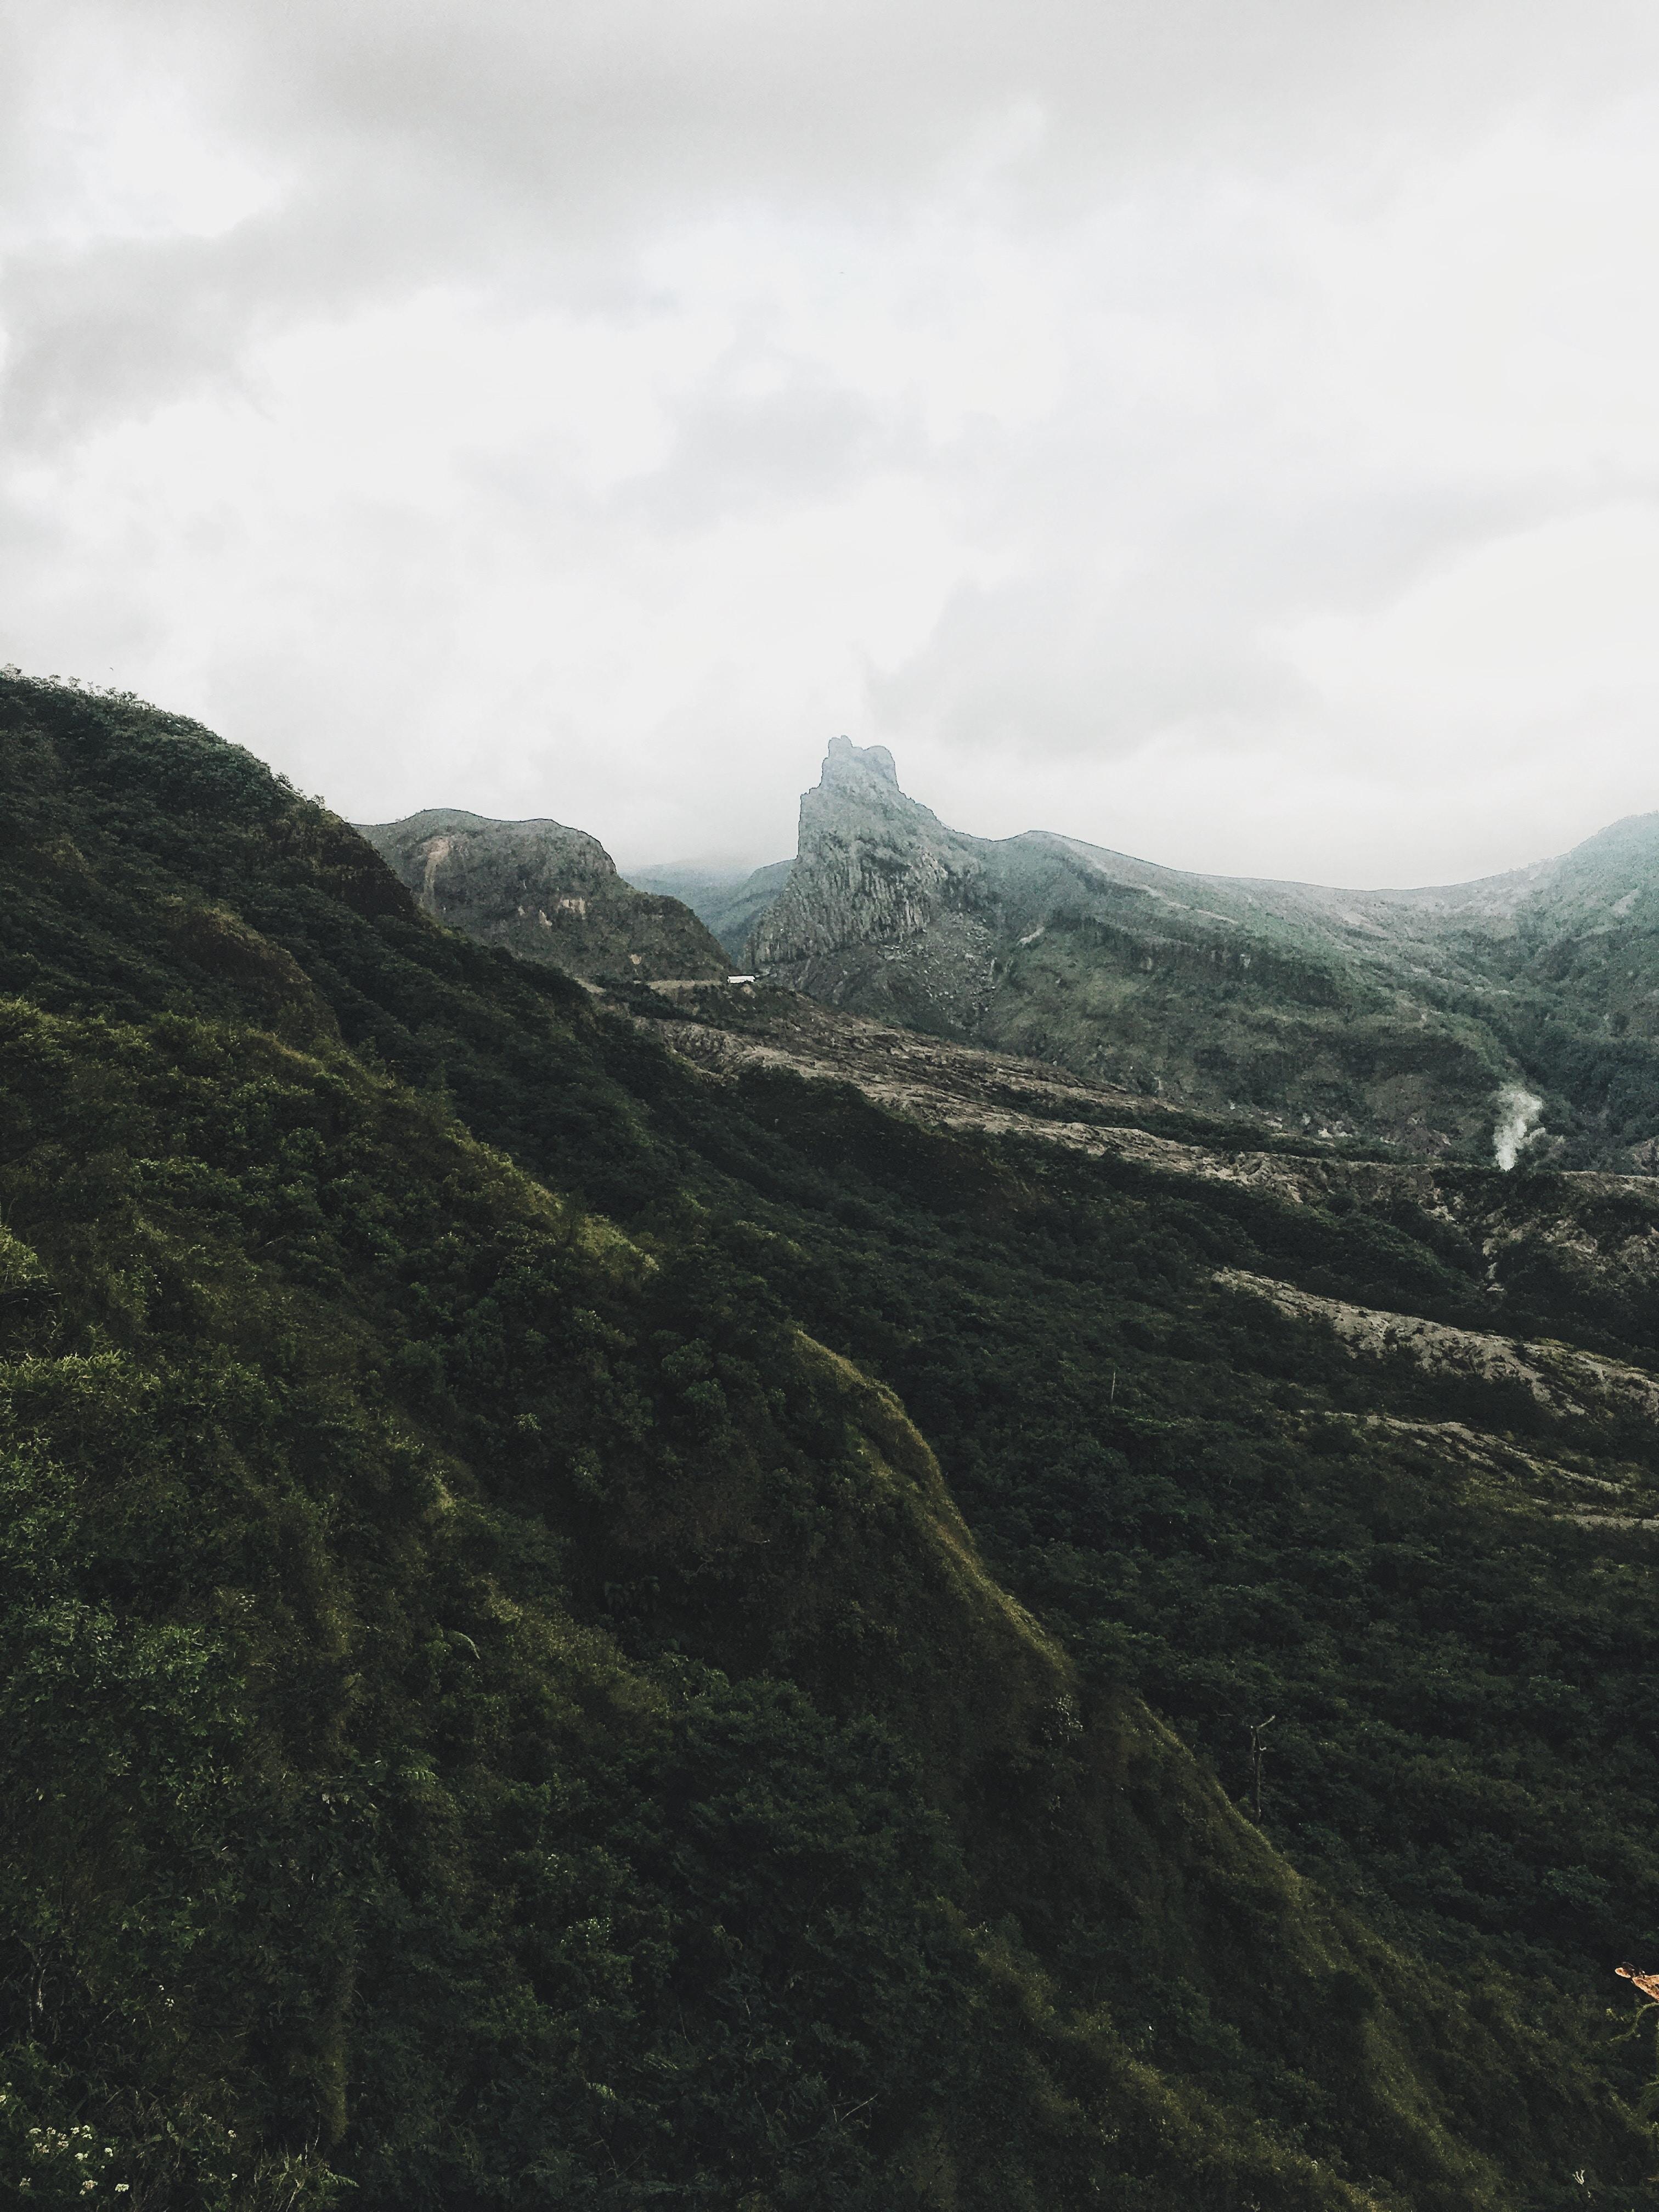 brown and green mountain range